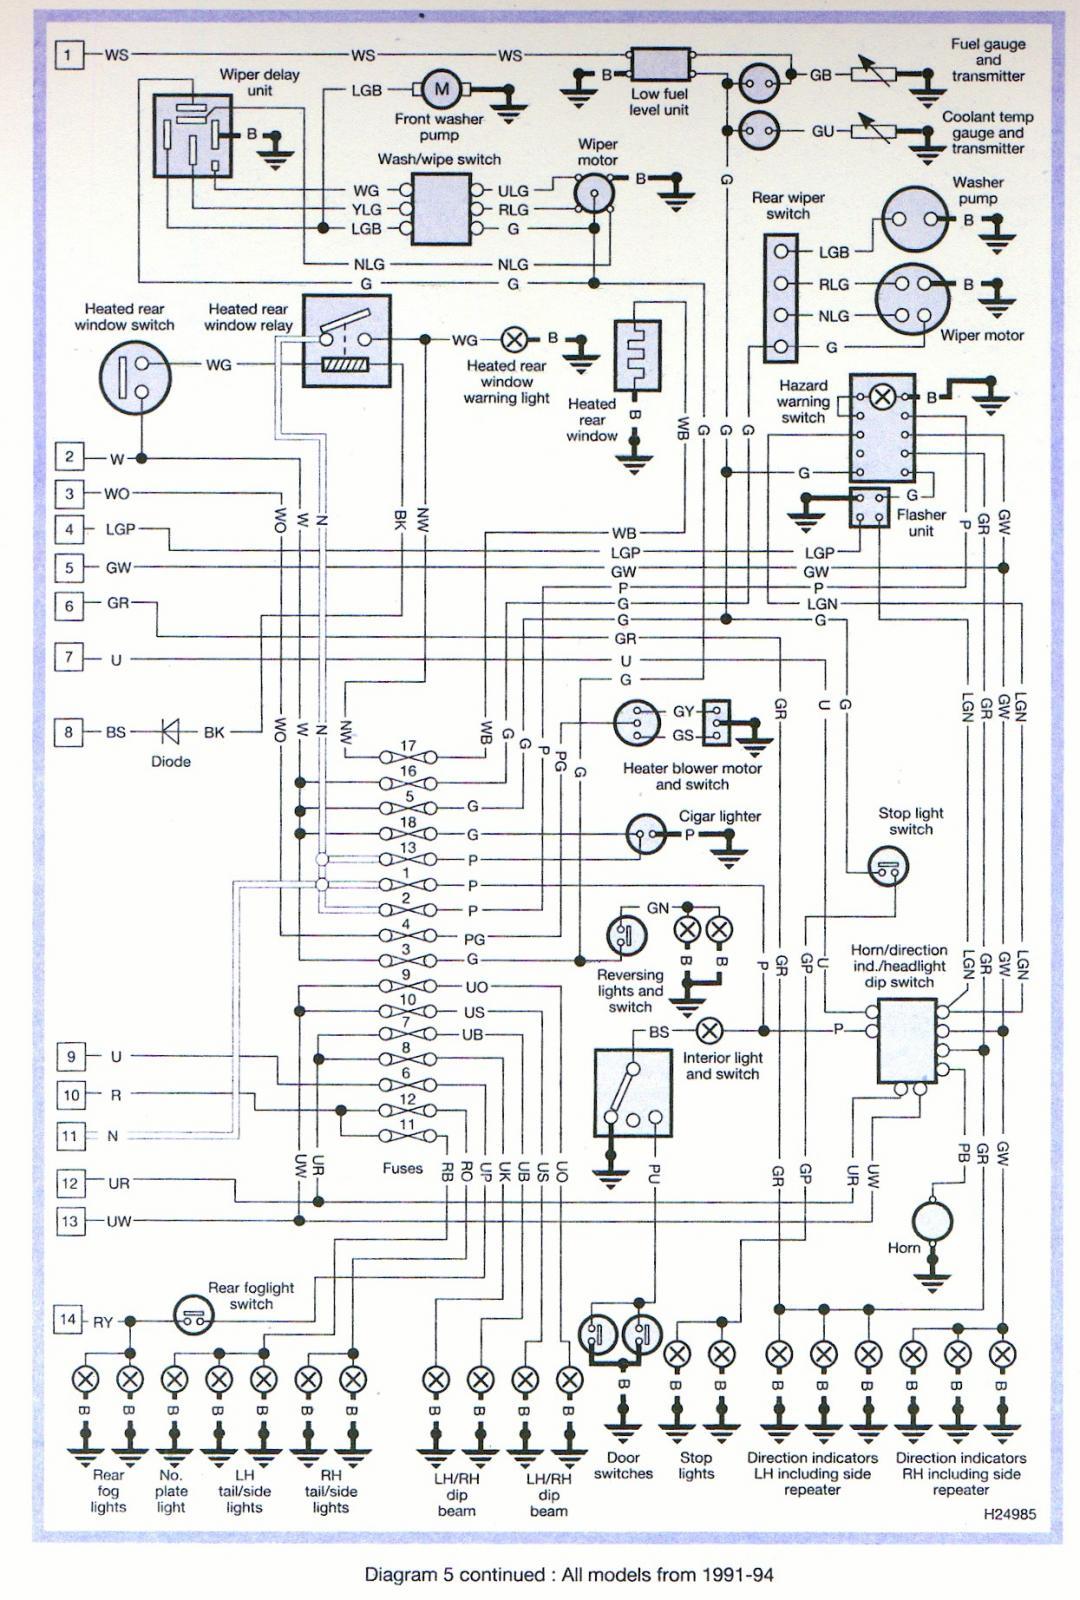 land rover discovery 4 trailer plug wiring diagram warn a2000 upgrade indicators broken defender forum lr4x4 the